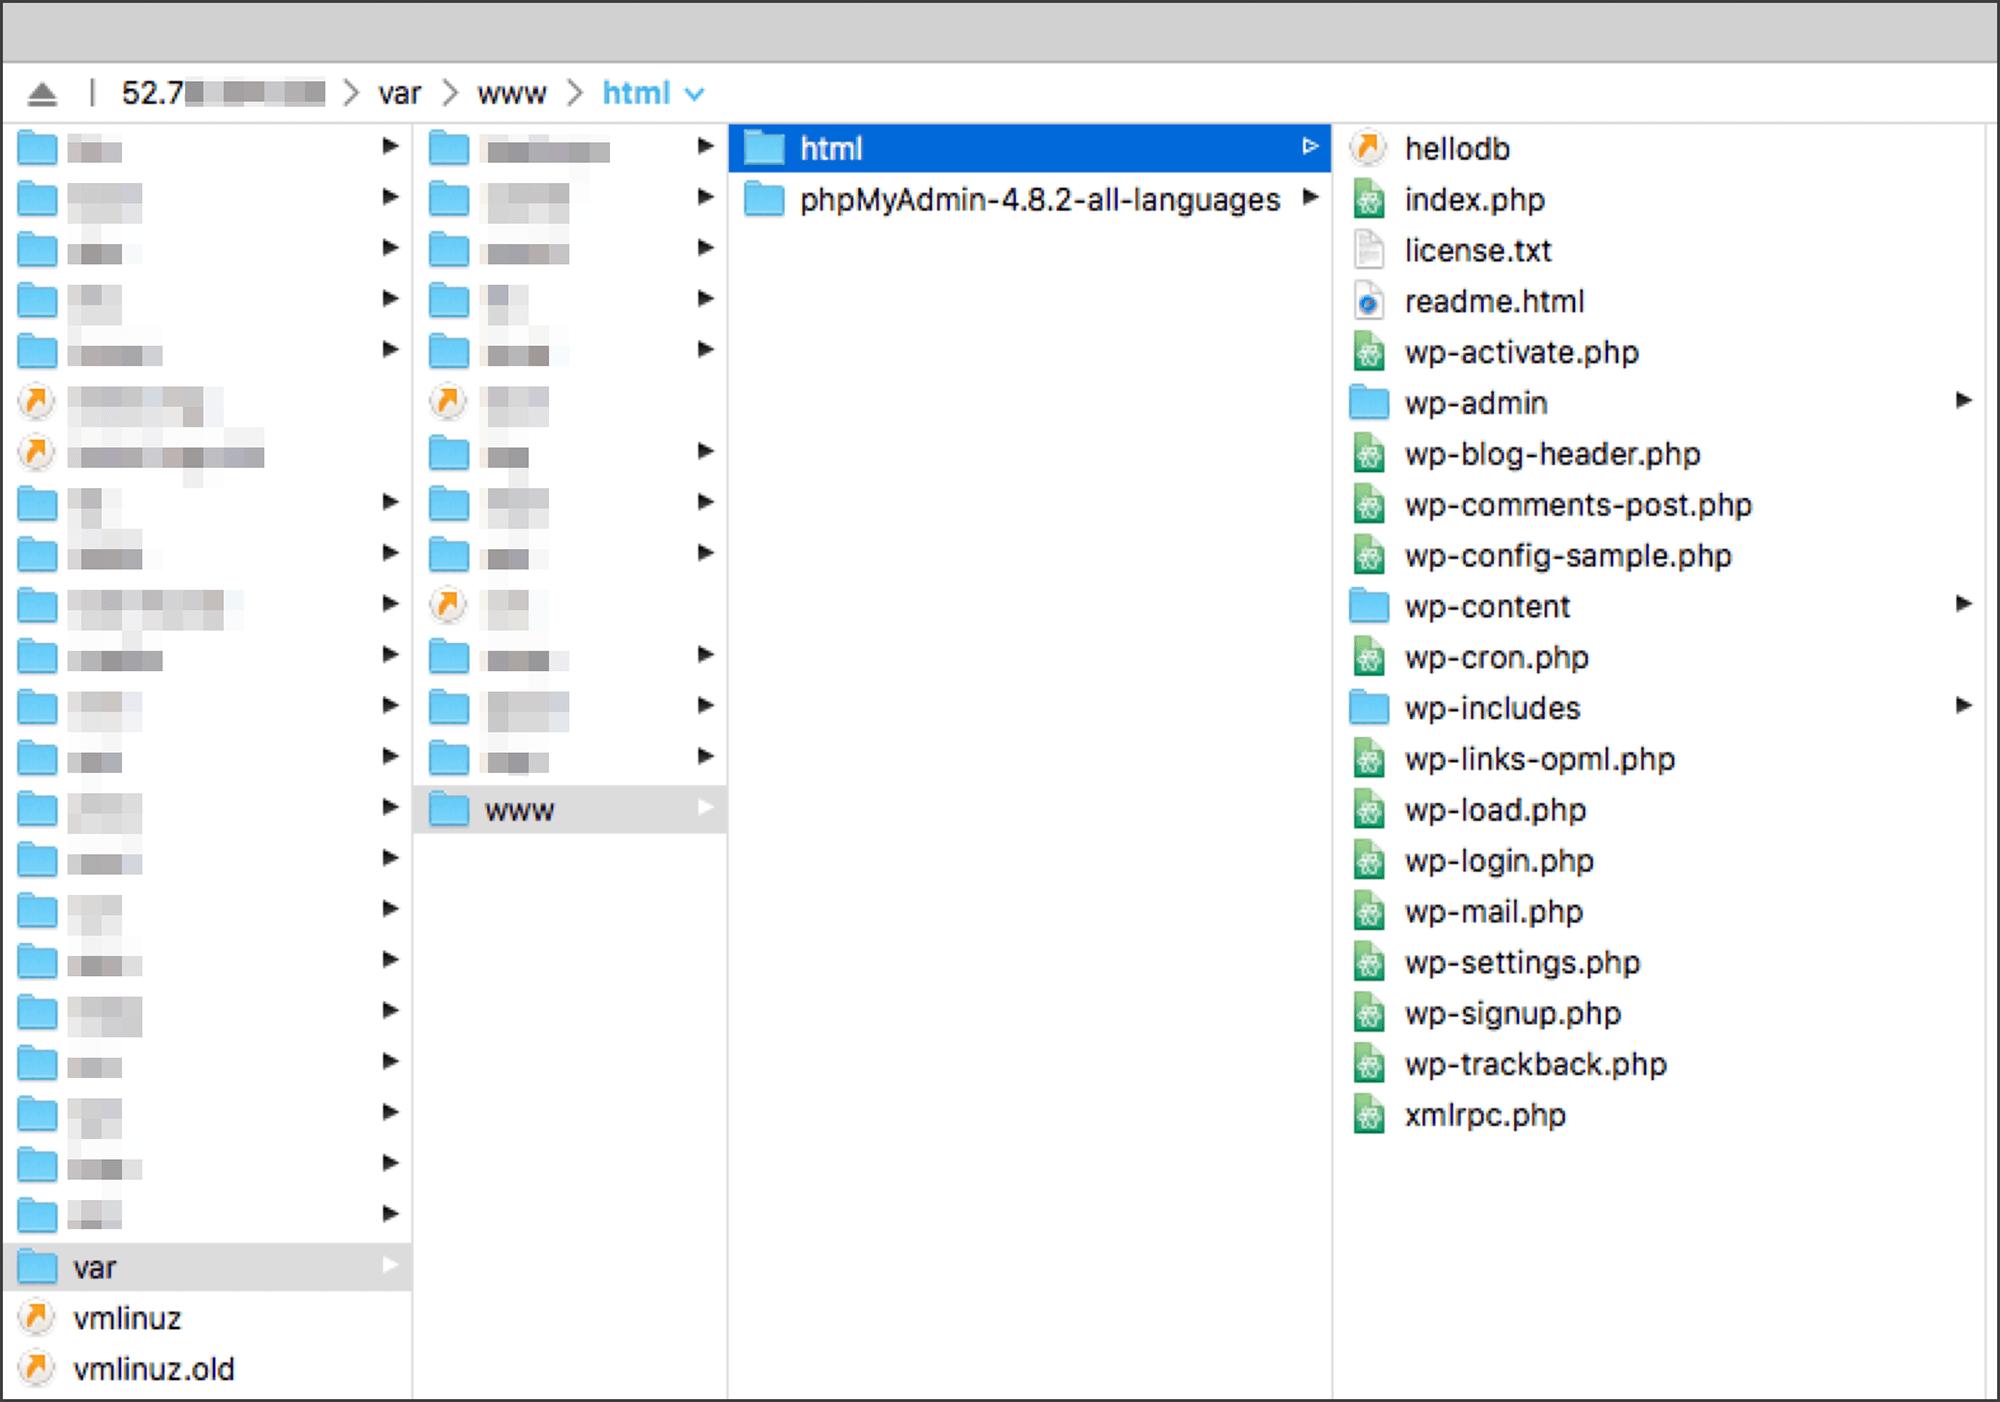 SFTP 클라이언트에서 본 워드프레스 디렉토리 구조 및 파일